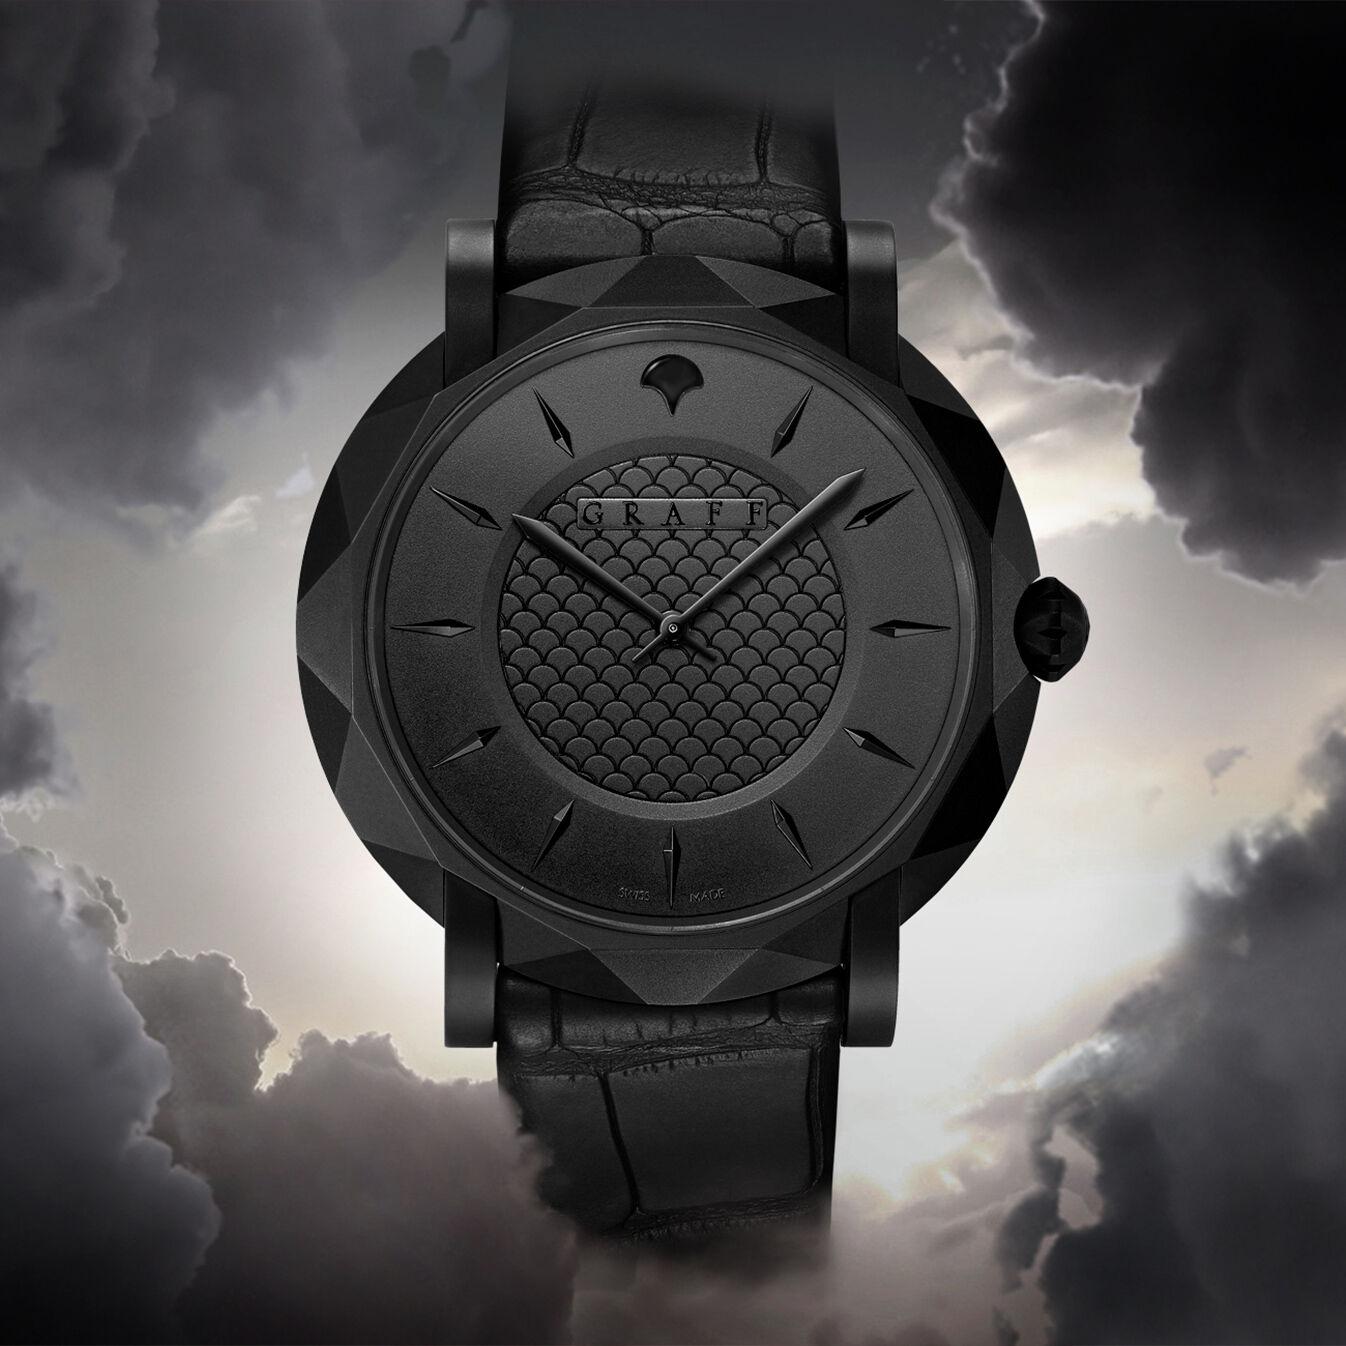 Graff Eclipse watch on a grey cloudy background